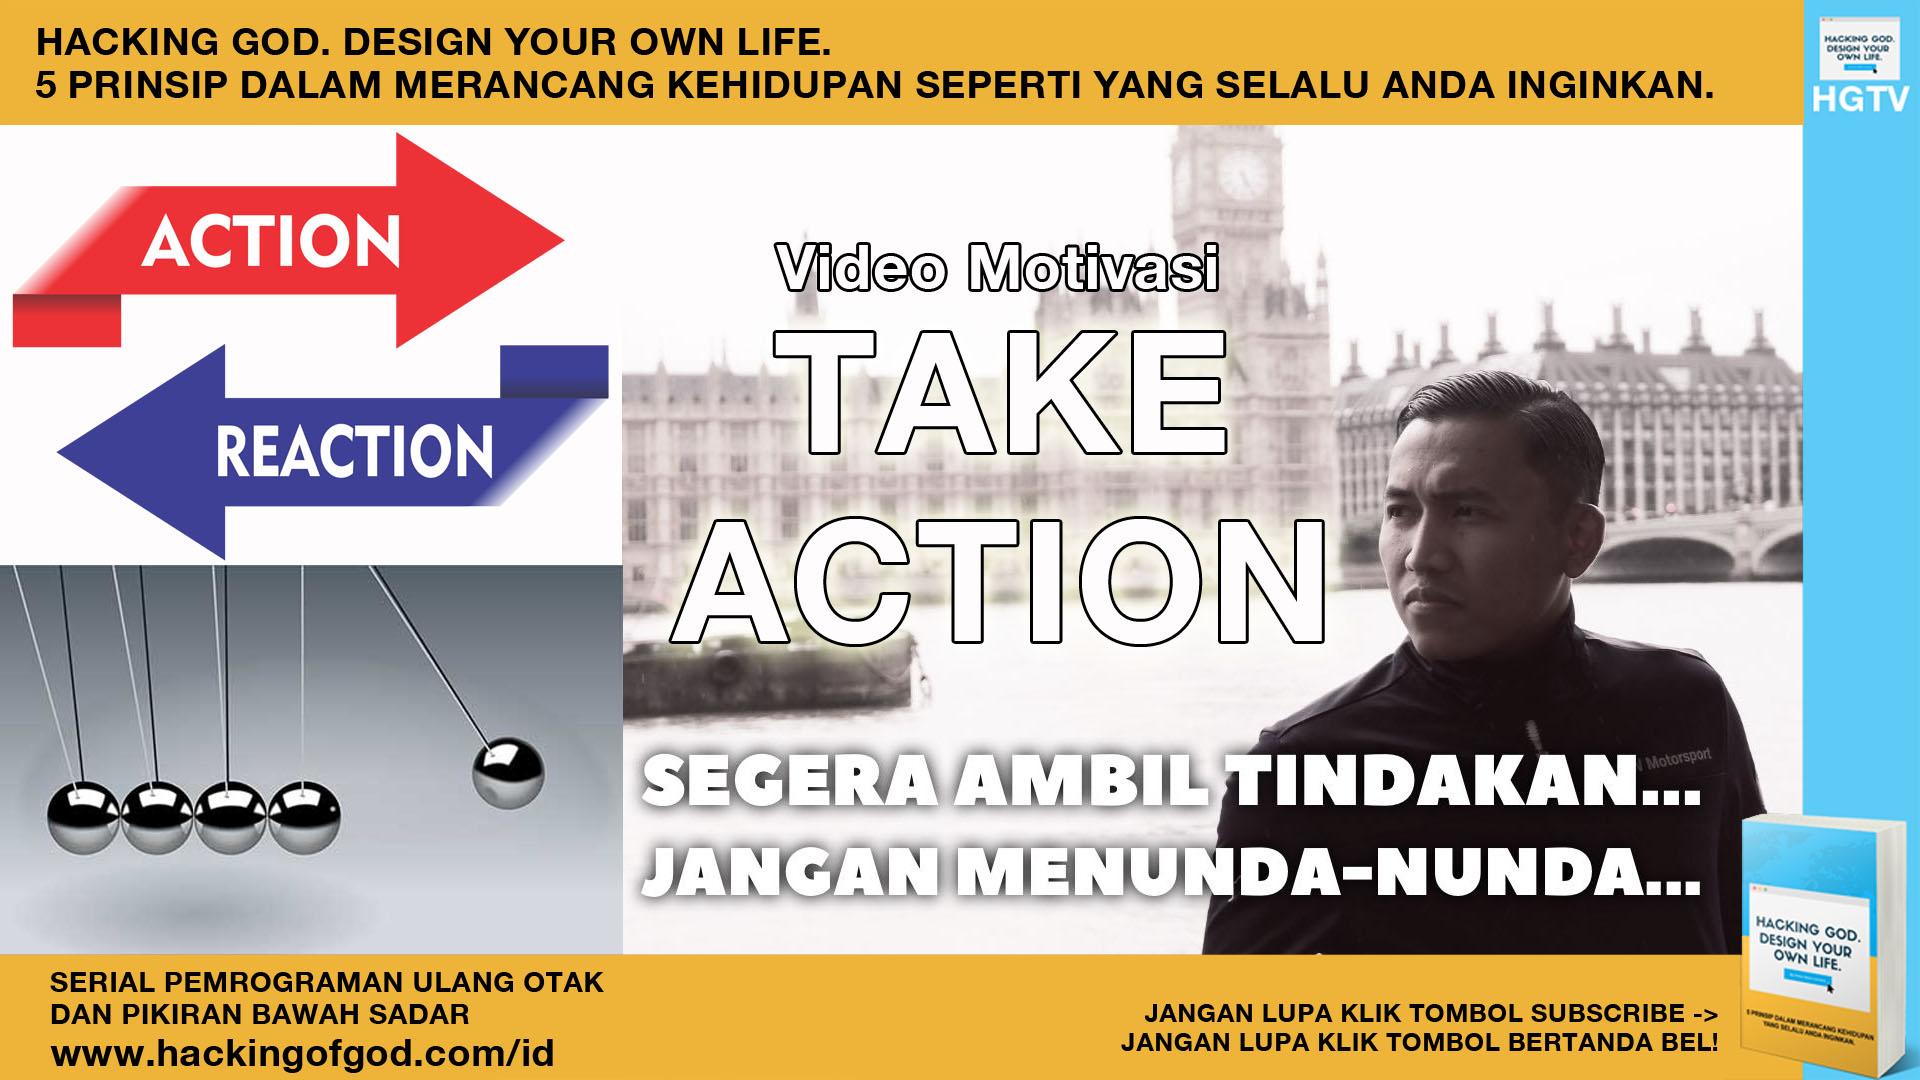 Video Motivasi – Take Action! Segera Ambil Tindakan, Jangan Menunda-nunda